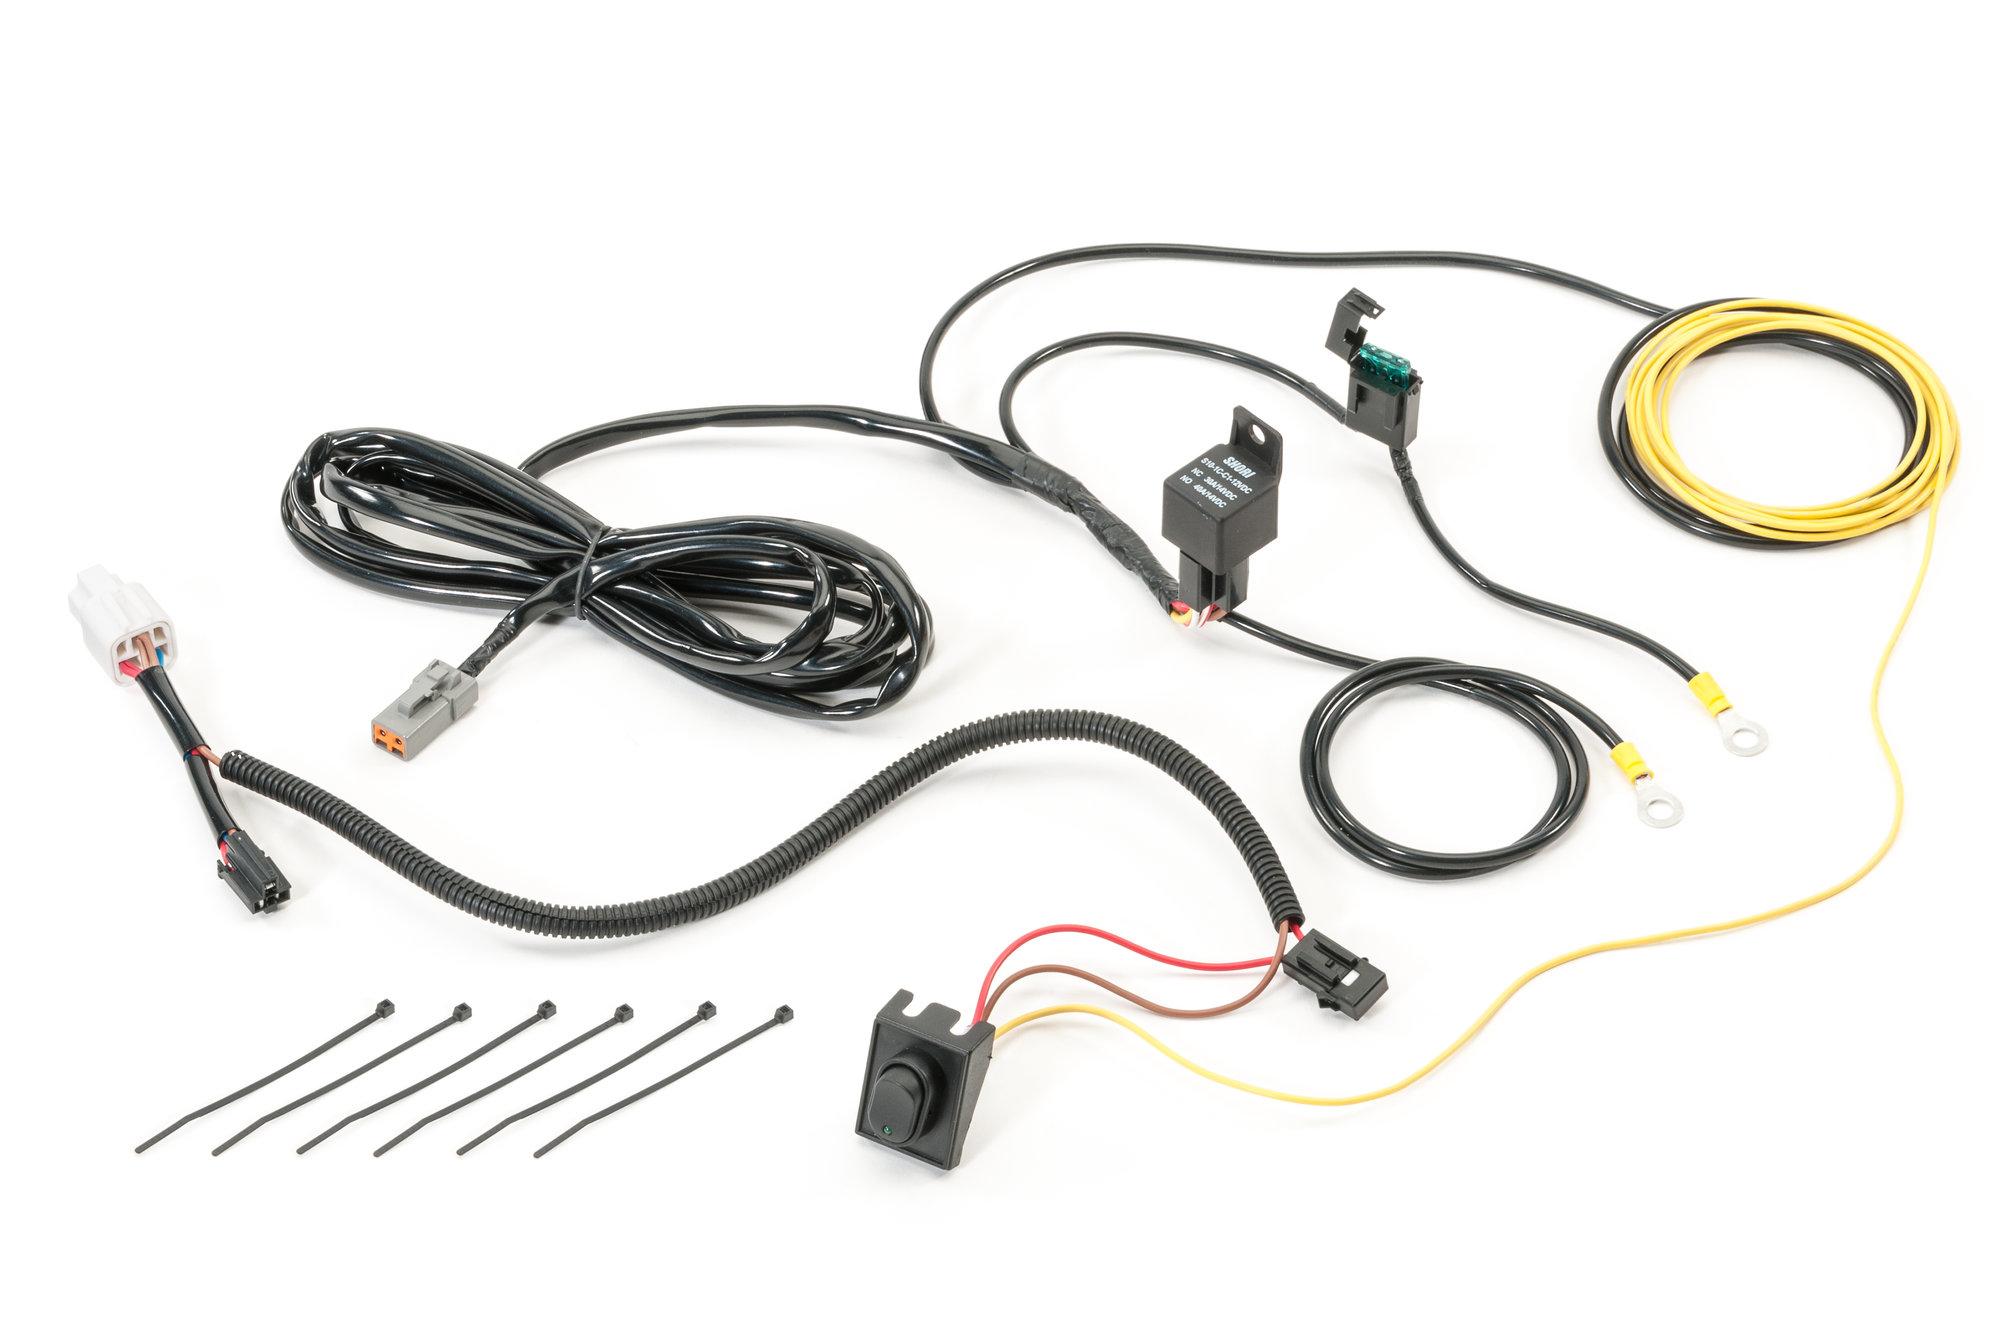 Quadratec 10 Led Light Bar With Wiring Harness